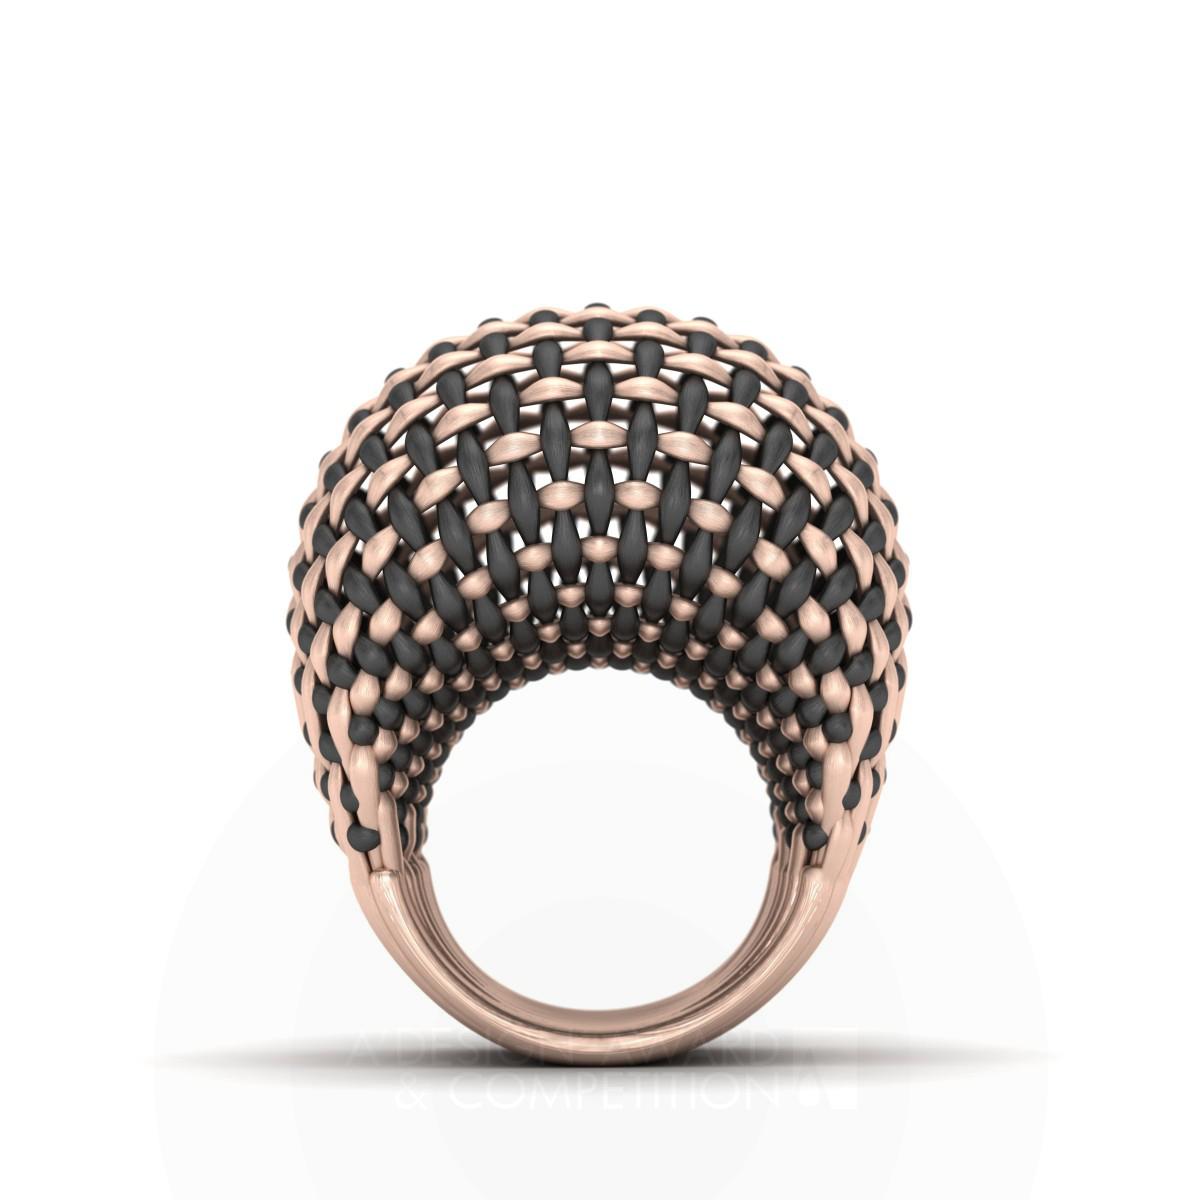 Interwoven Gold Ring